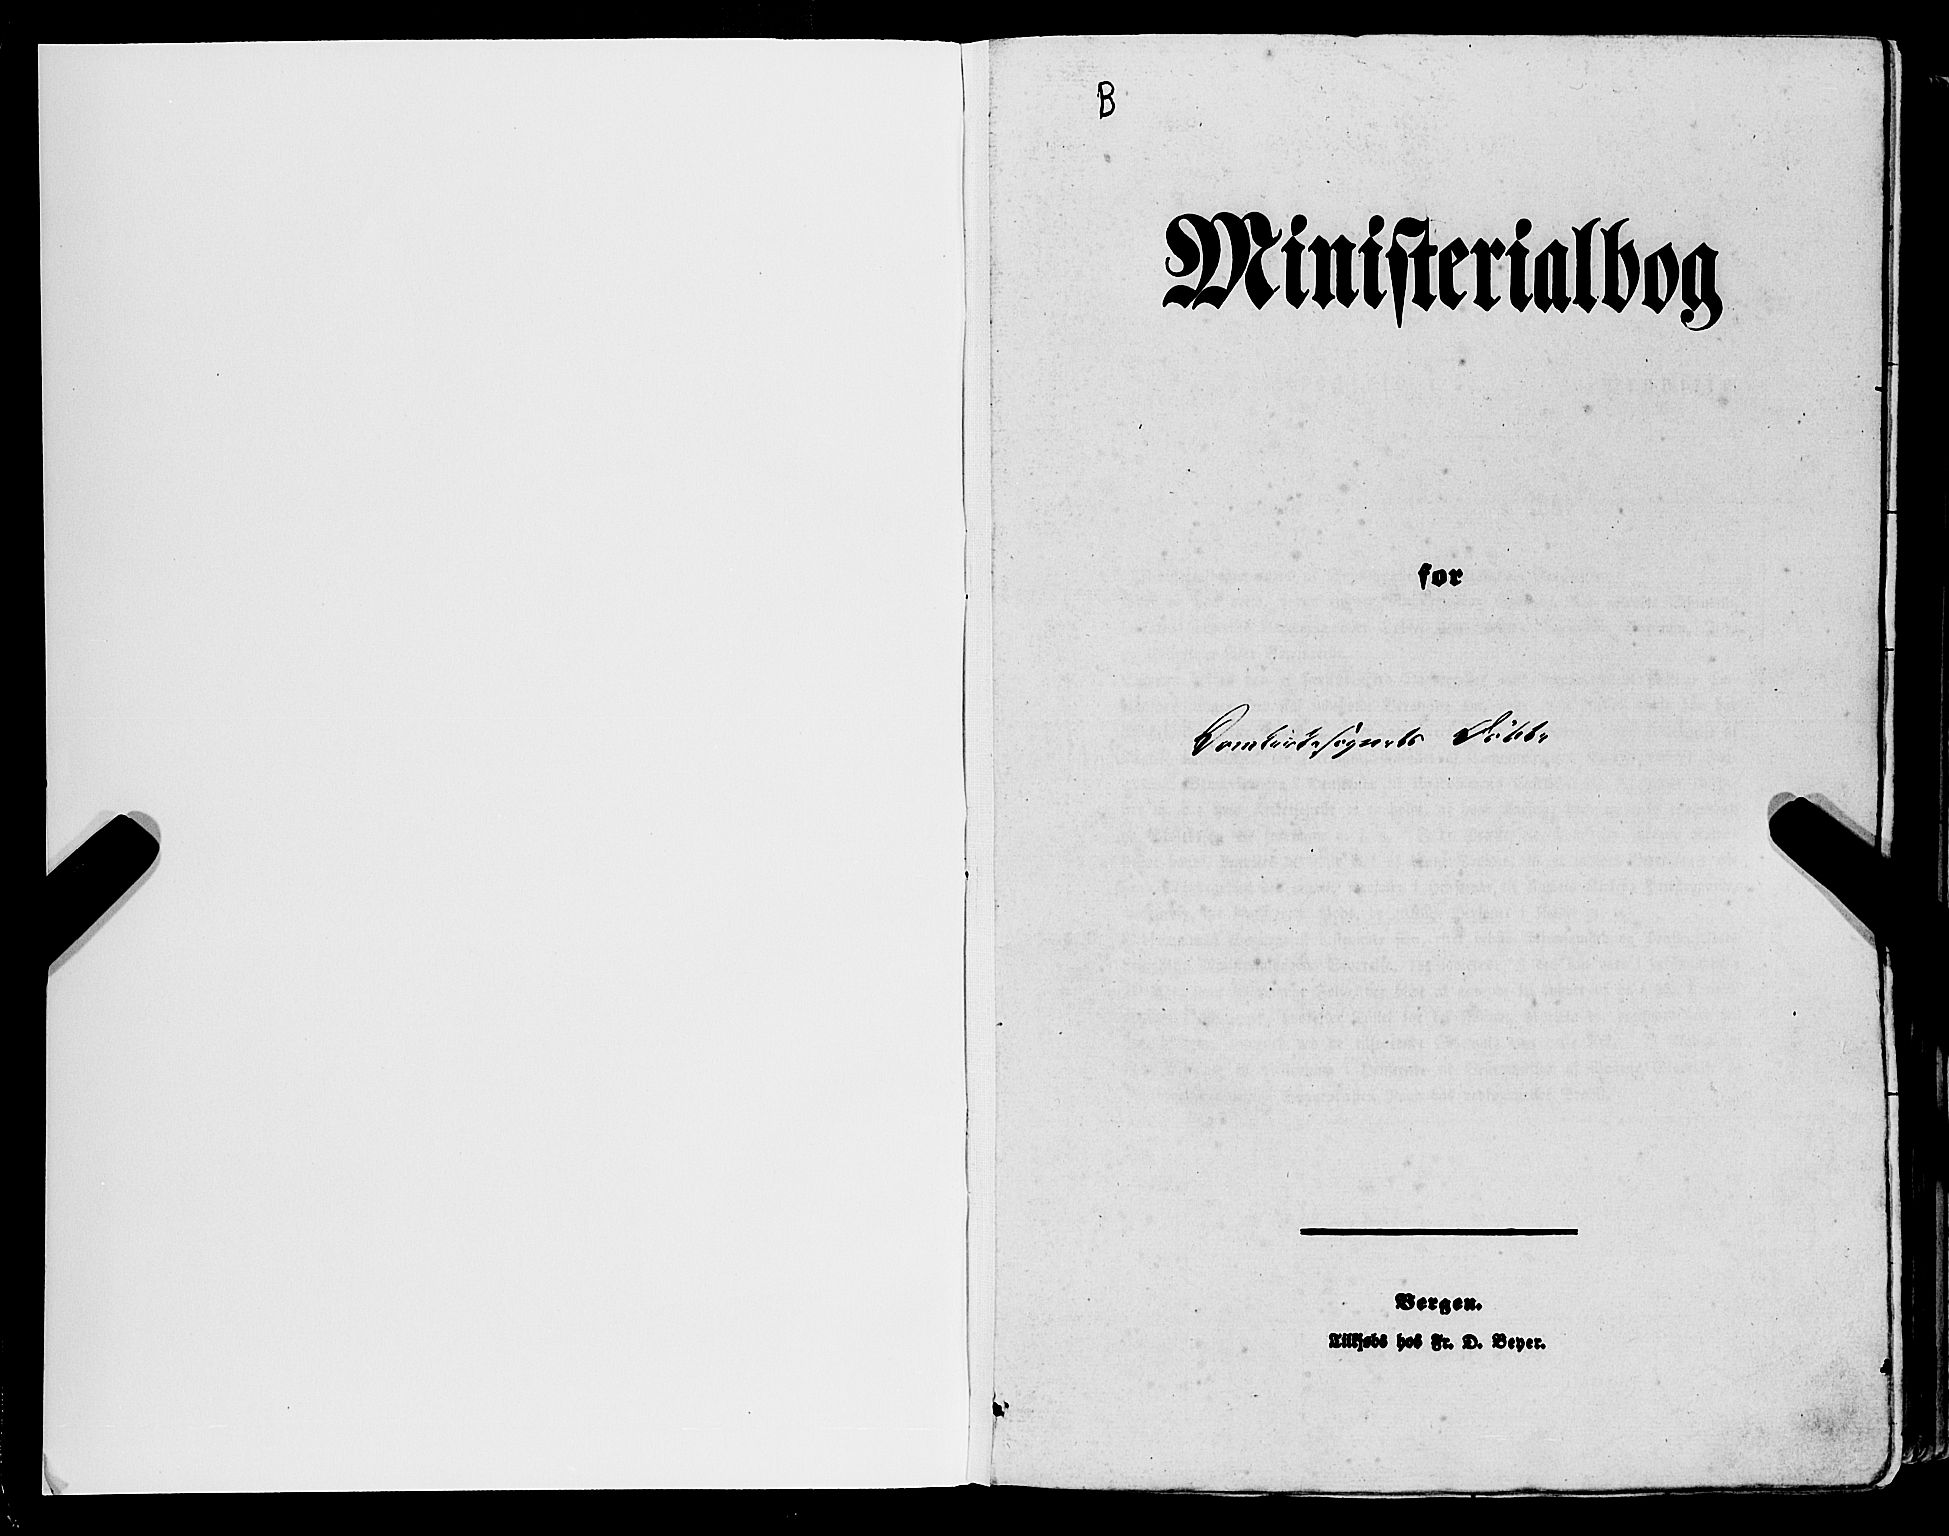 SAB, Domkirken Sokneprestembete, H/Haa/L0020: Ministerialbok nr. B 3, 1851-1859